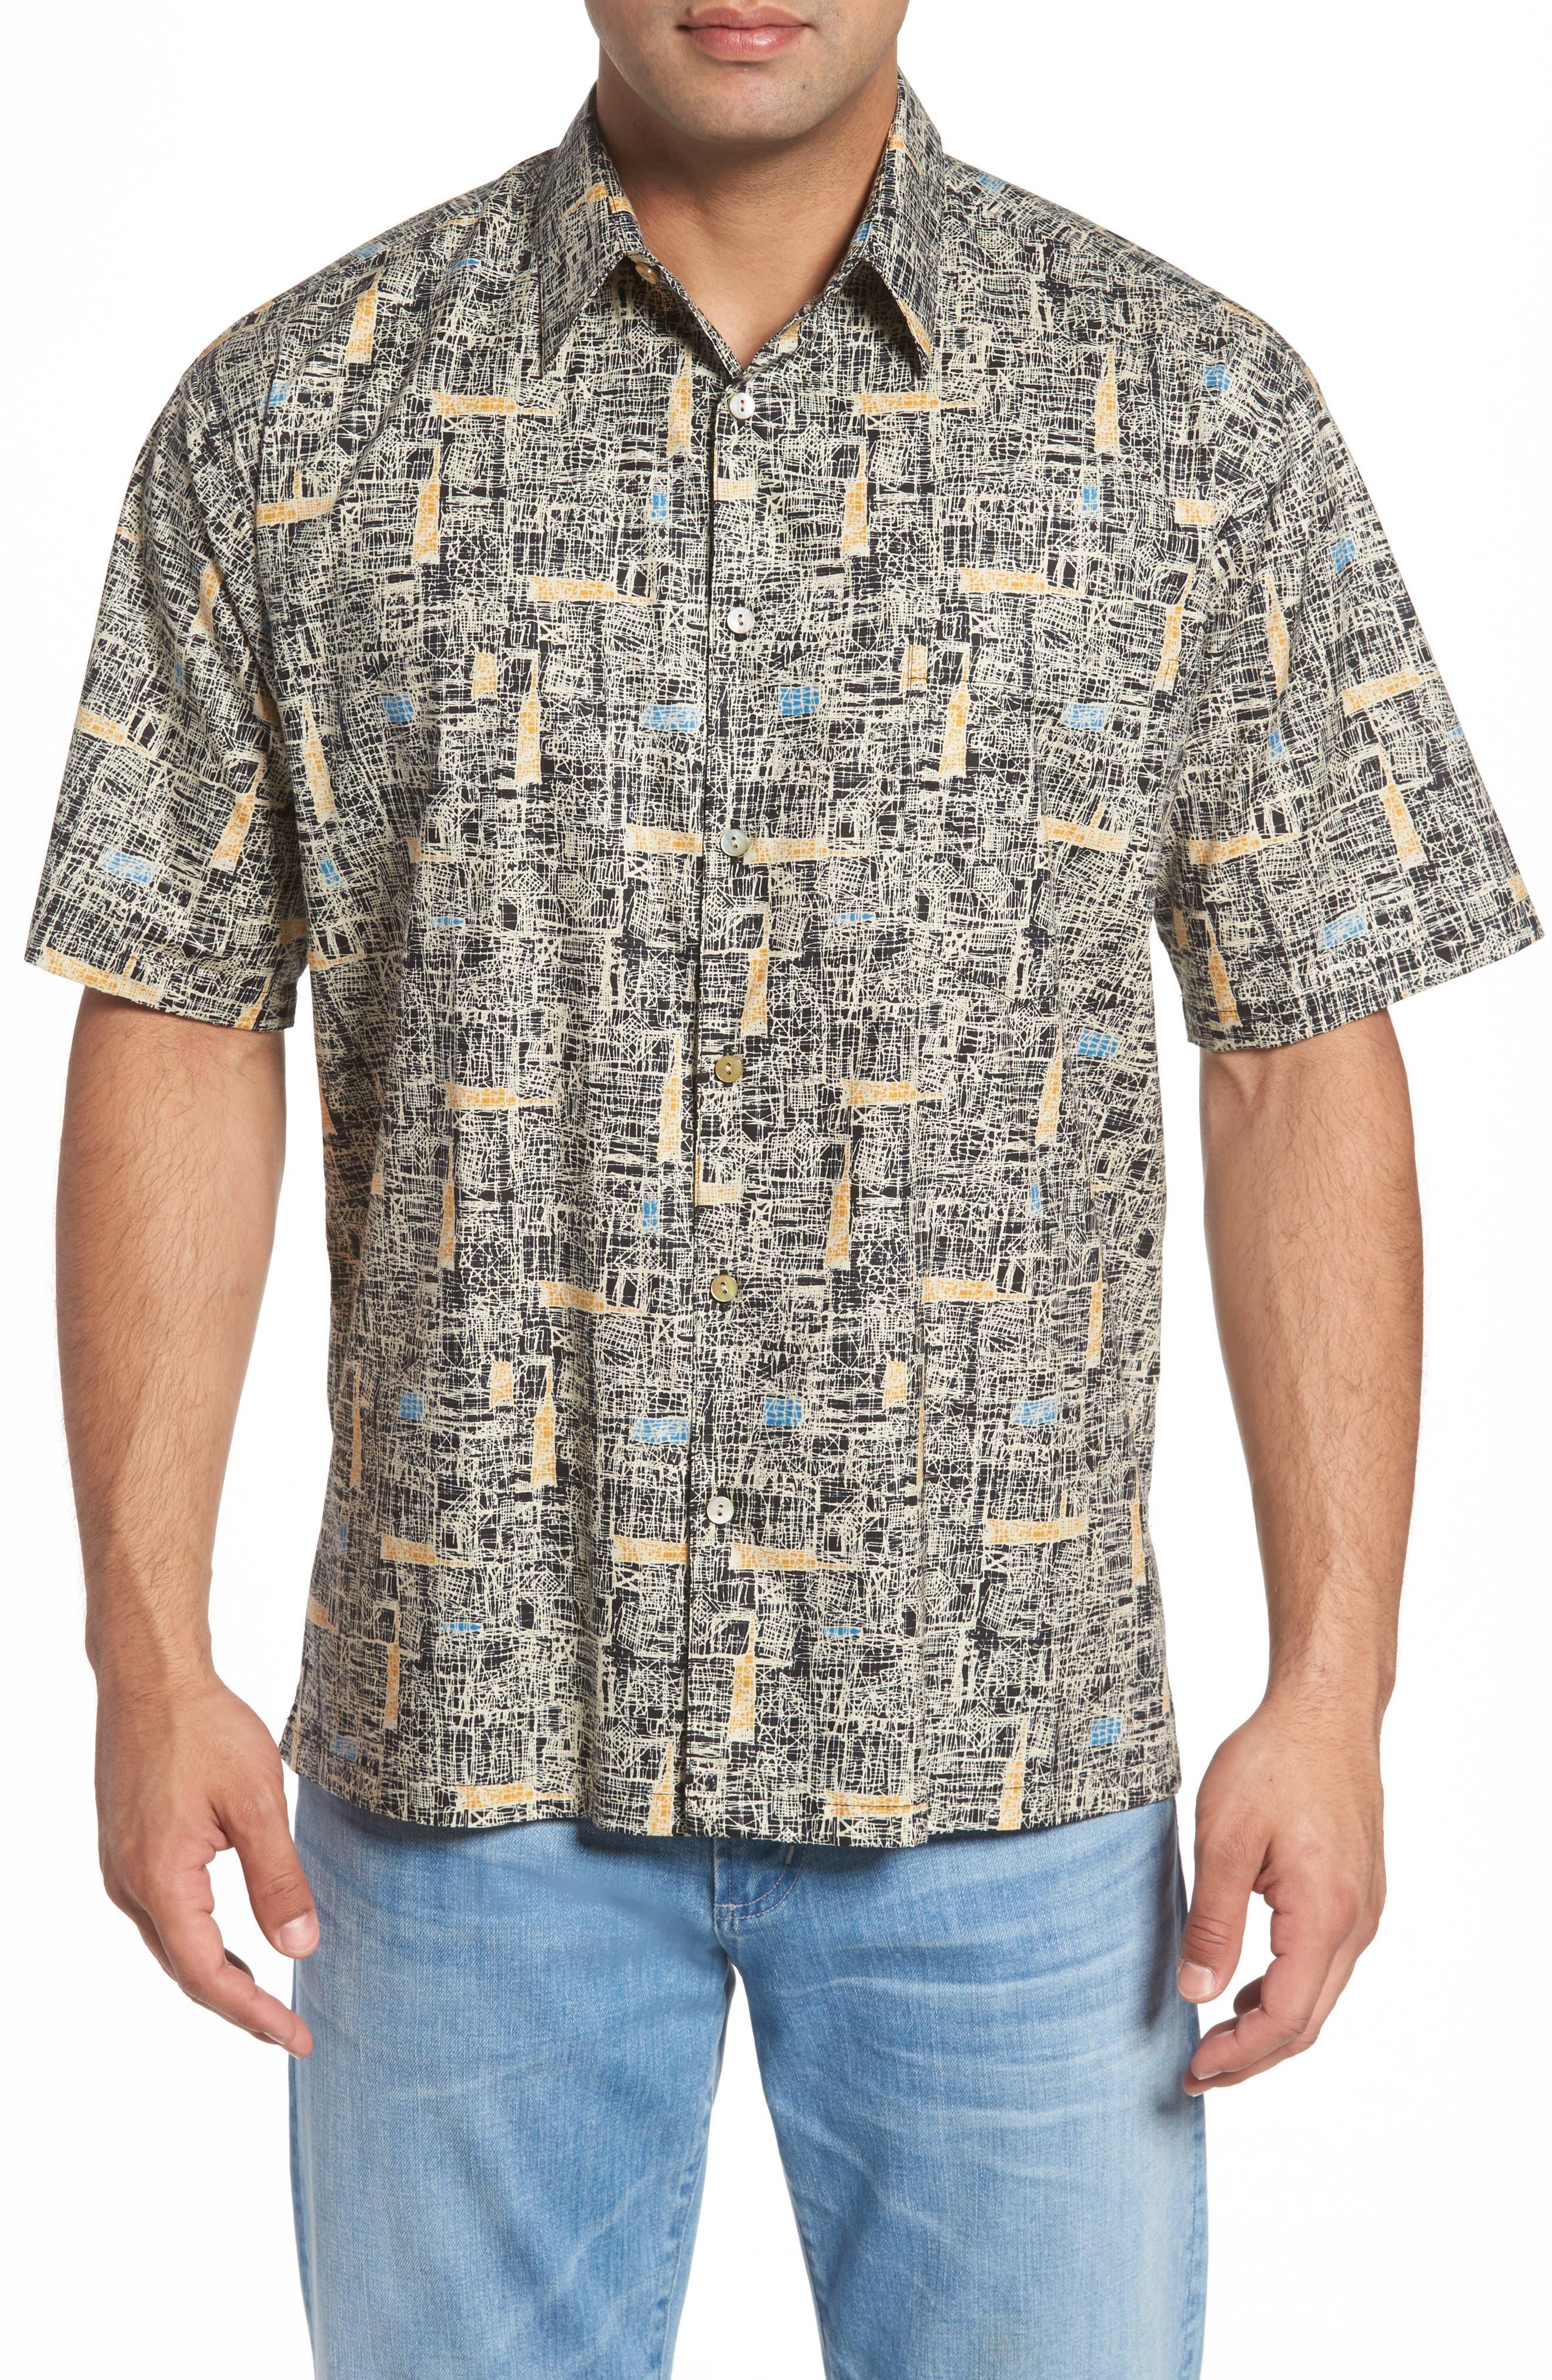 Tori Richard Jasper Abstract Print Camp Shirt